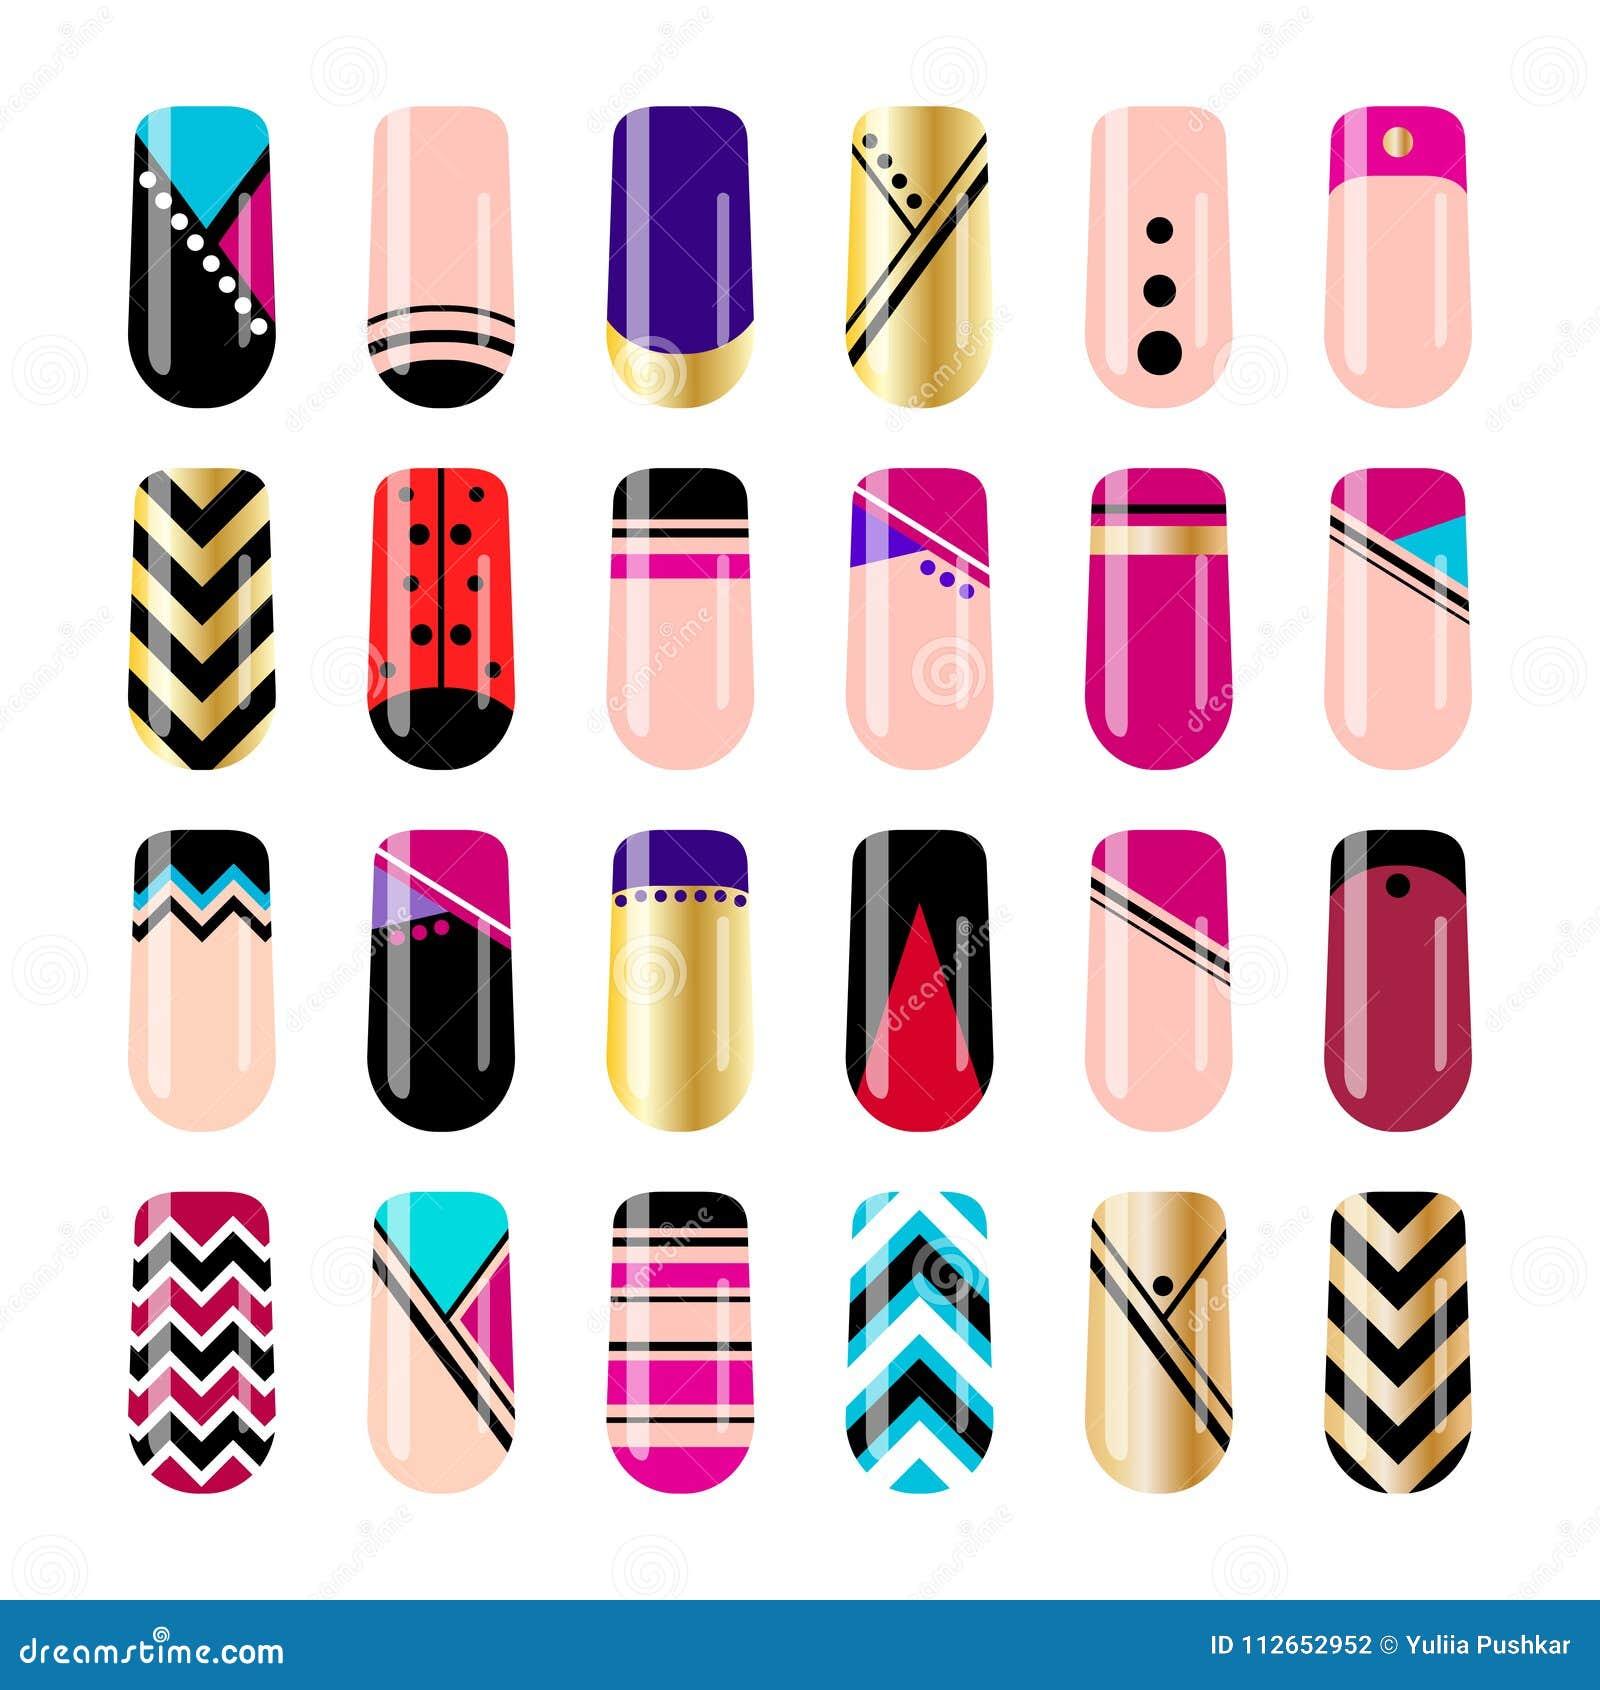 Nail Art Design Geometric Nail Stickers Template Stock Vector